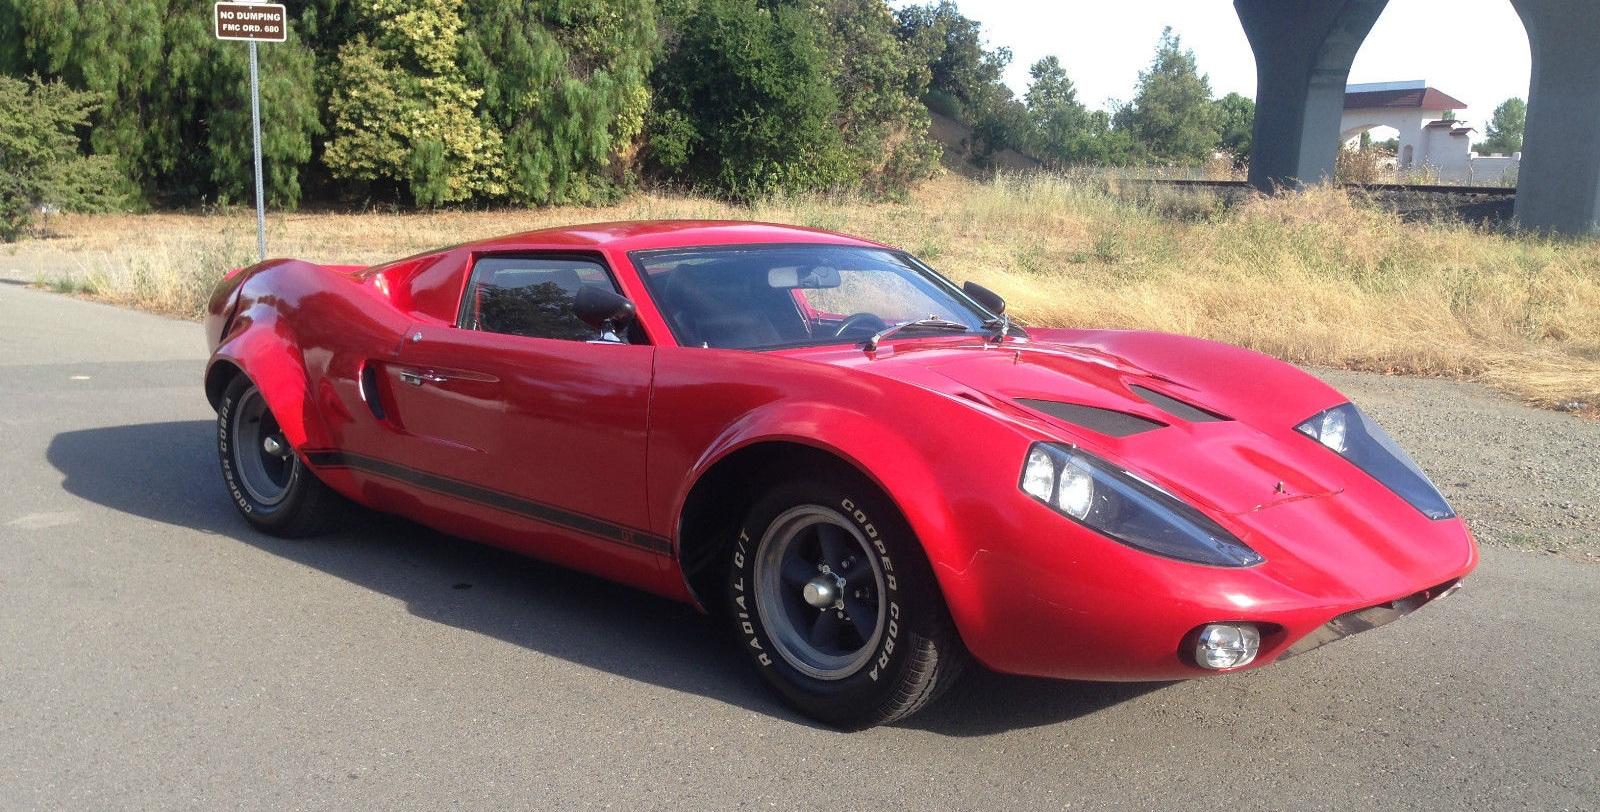 Daily Turismo: GTFourvair: 1972 Fiberfab Avenger GT-15